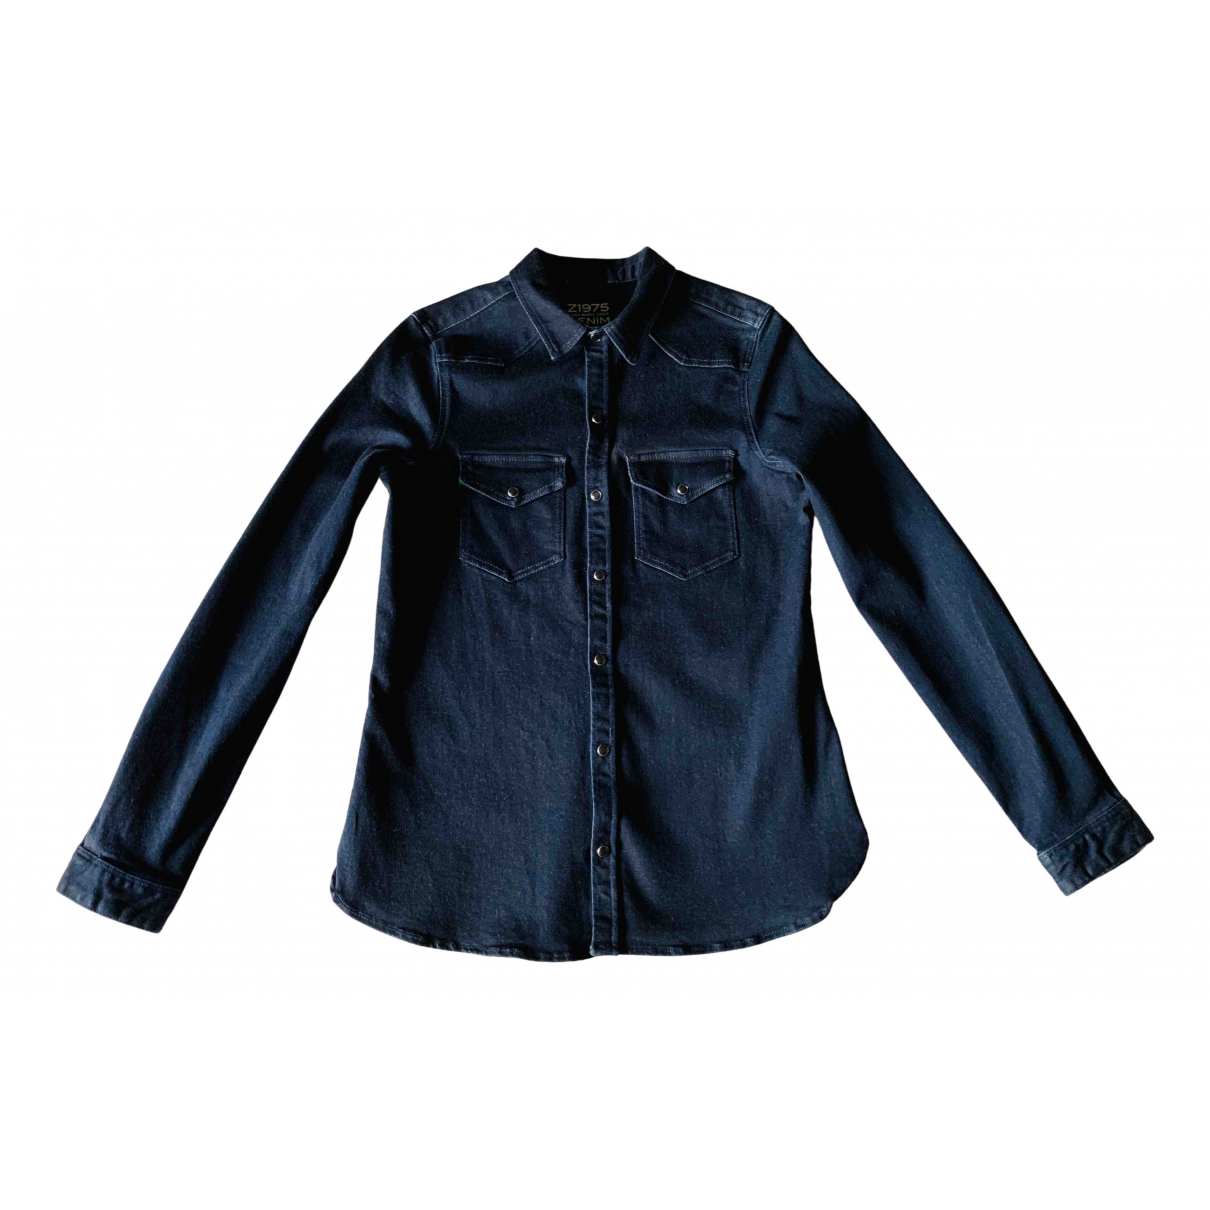 Zara \N Blue Cotton jacket for Women M International